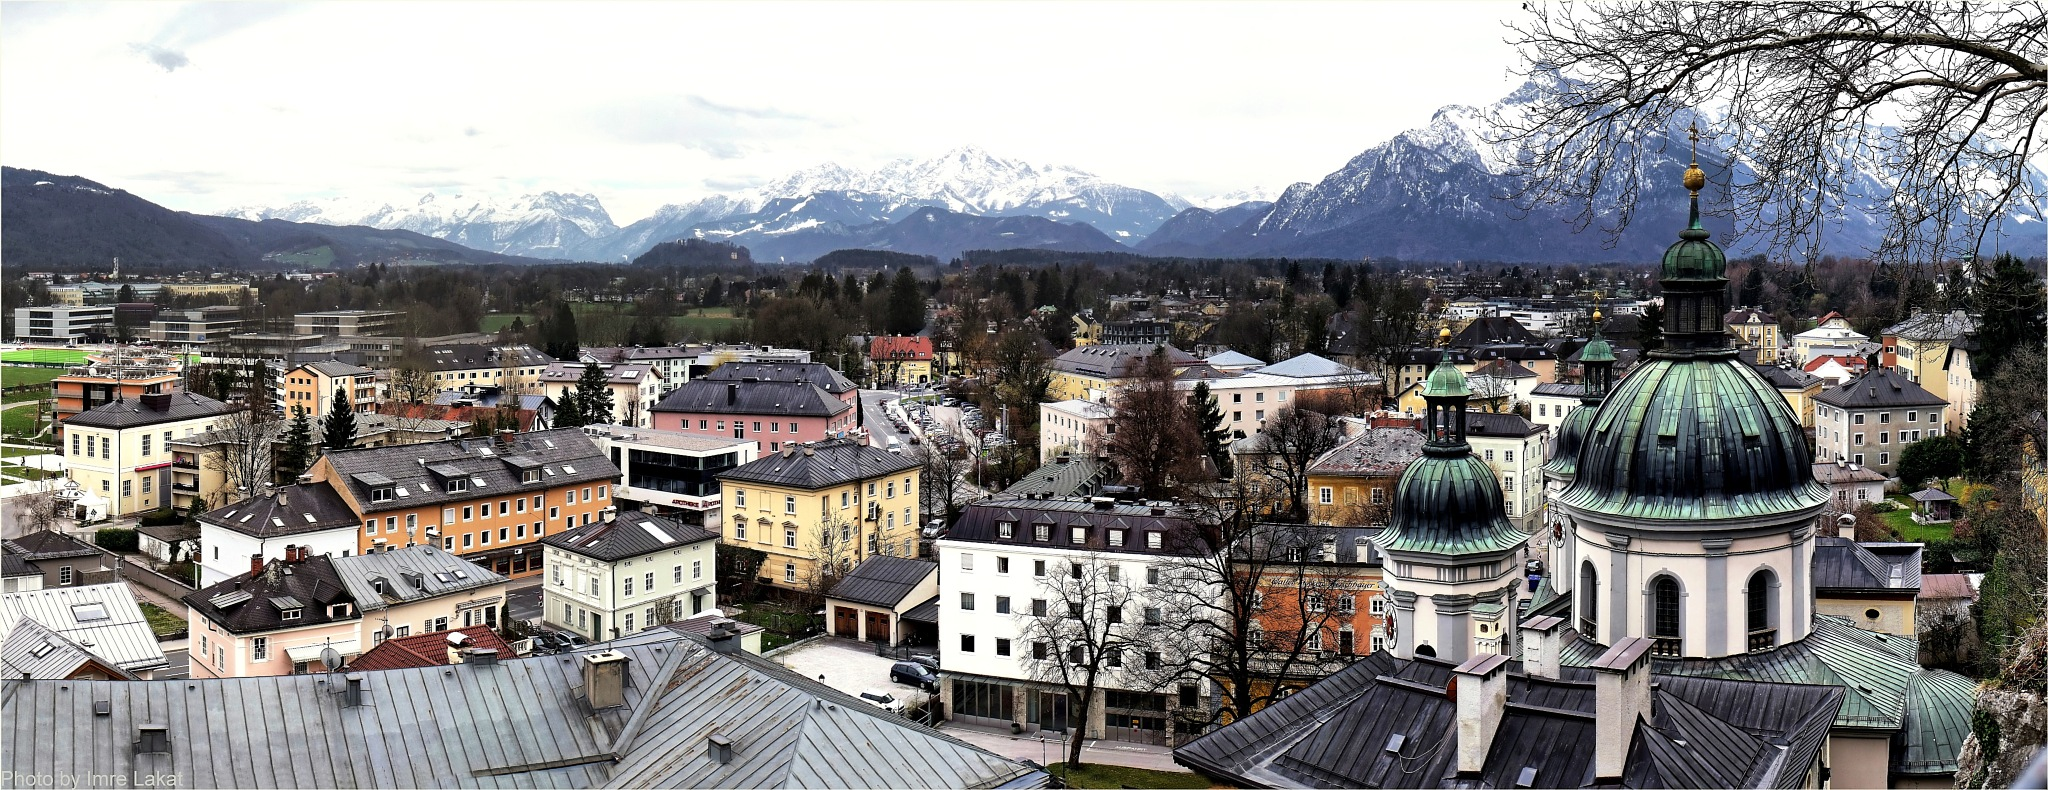 Nonnberggasse 4, 5020 Salzburg, Ausztria by Imre Lakat